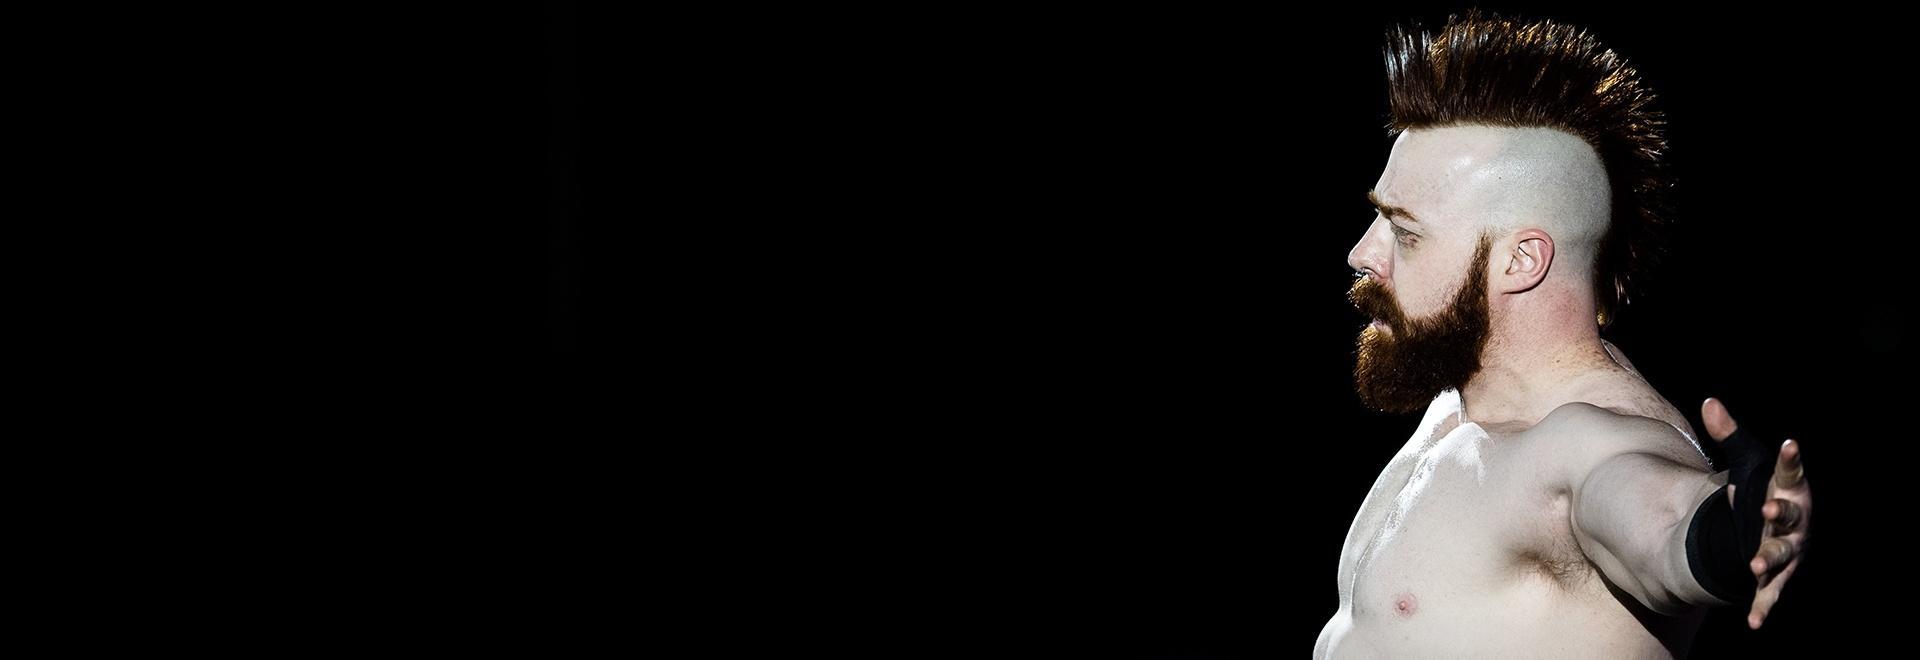 Ep. 39